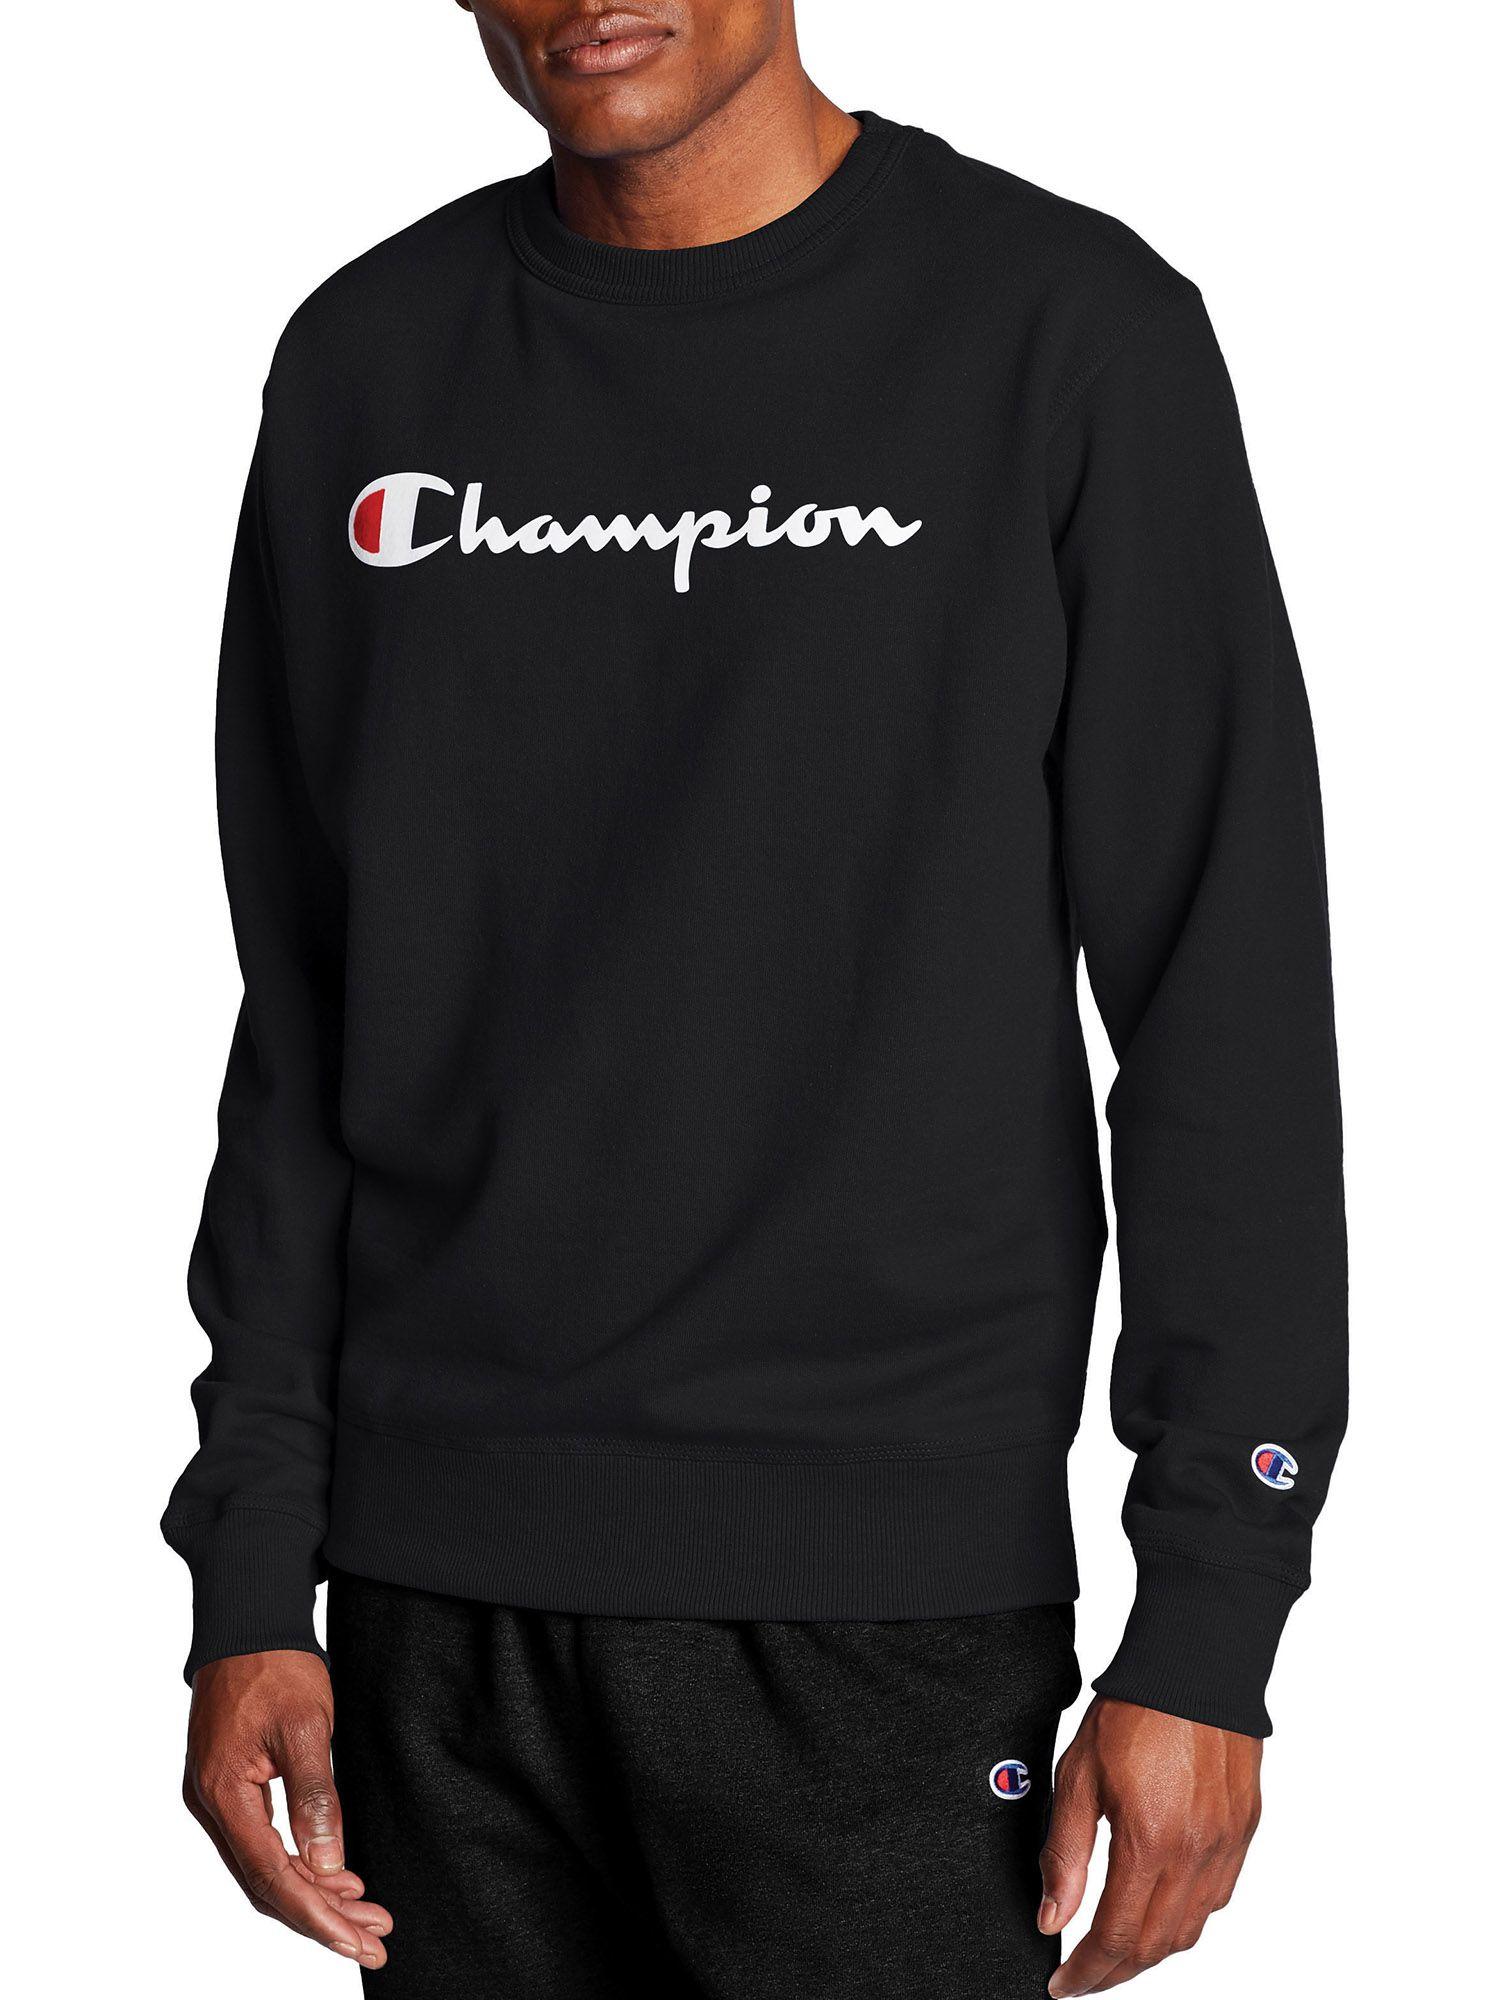 Champion Champion Men S Powerblend Graphic Crew Sweatshirt Walmart Com Graphic Crewneck Sweatshirt Sweatshirts Graphic Crew Neck Sweatshirts [ 2000 x 1500 Pixel ]